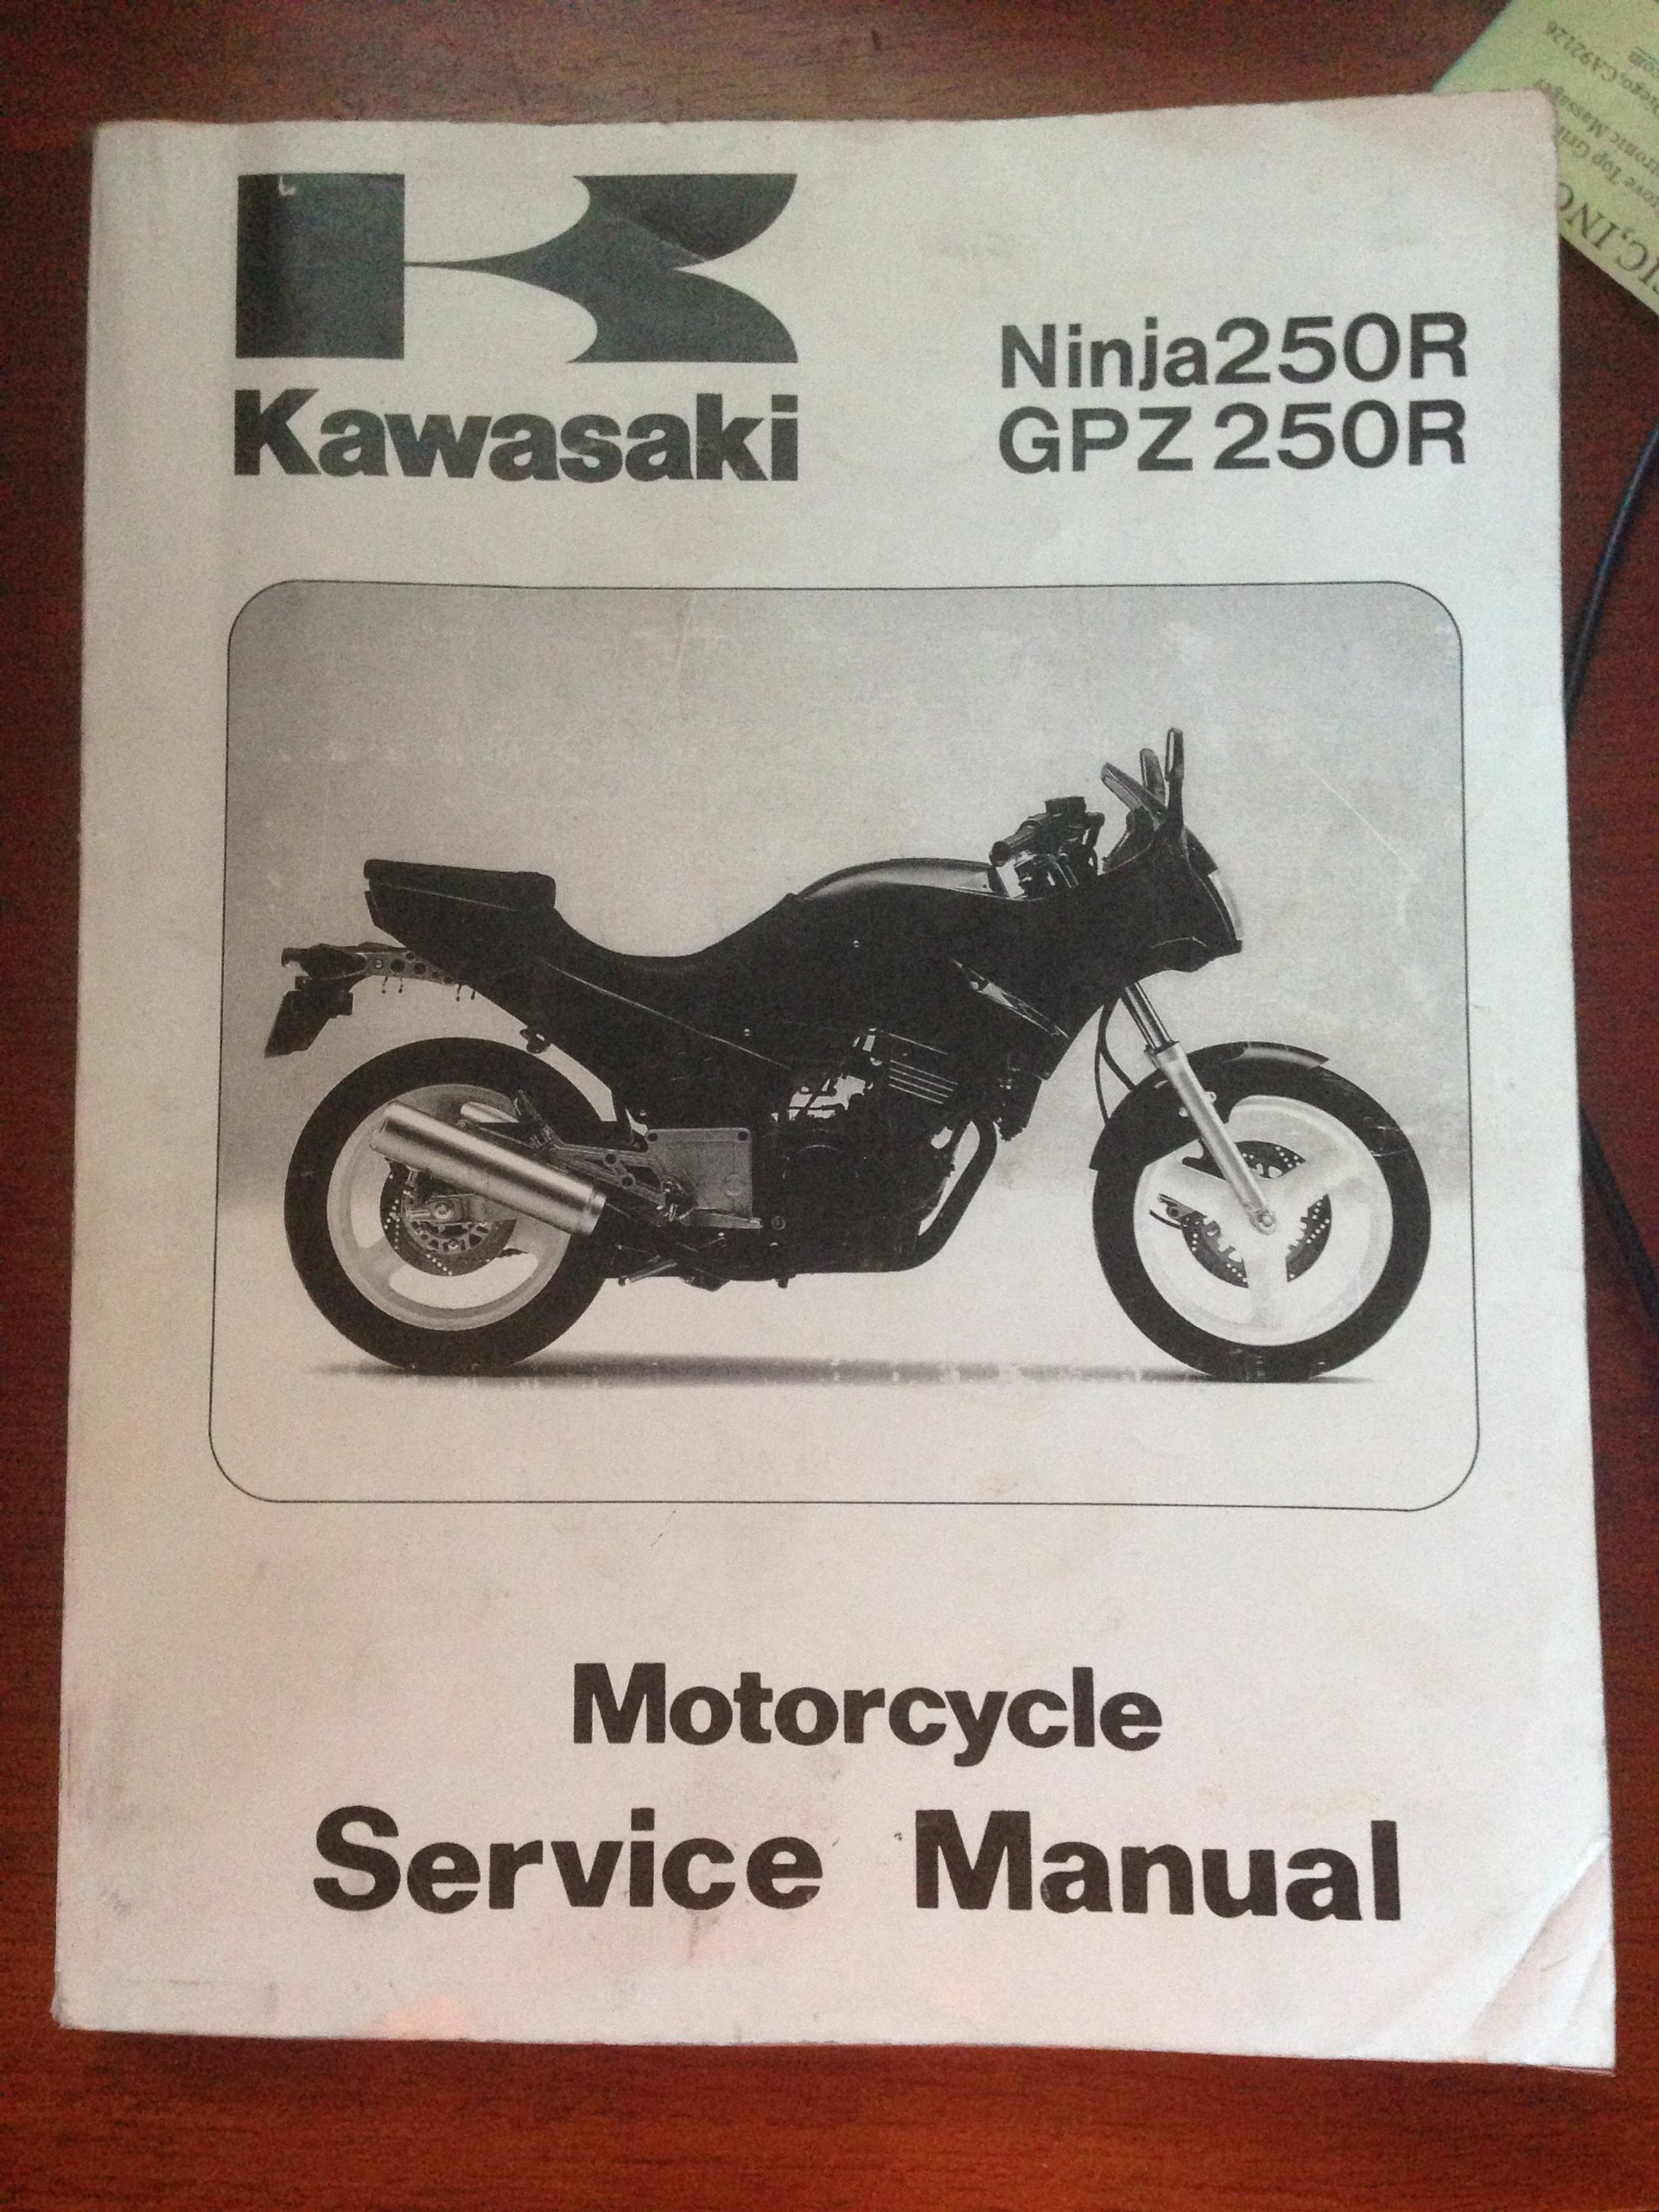 1986 1987 Kawasaki Ninja 250R GPZ250R Service Manual Paperback – 1987